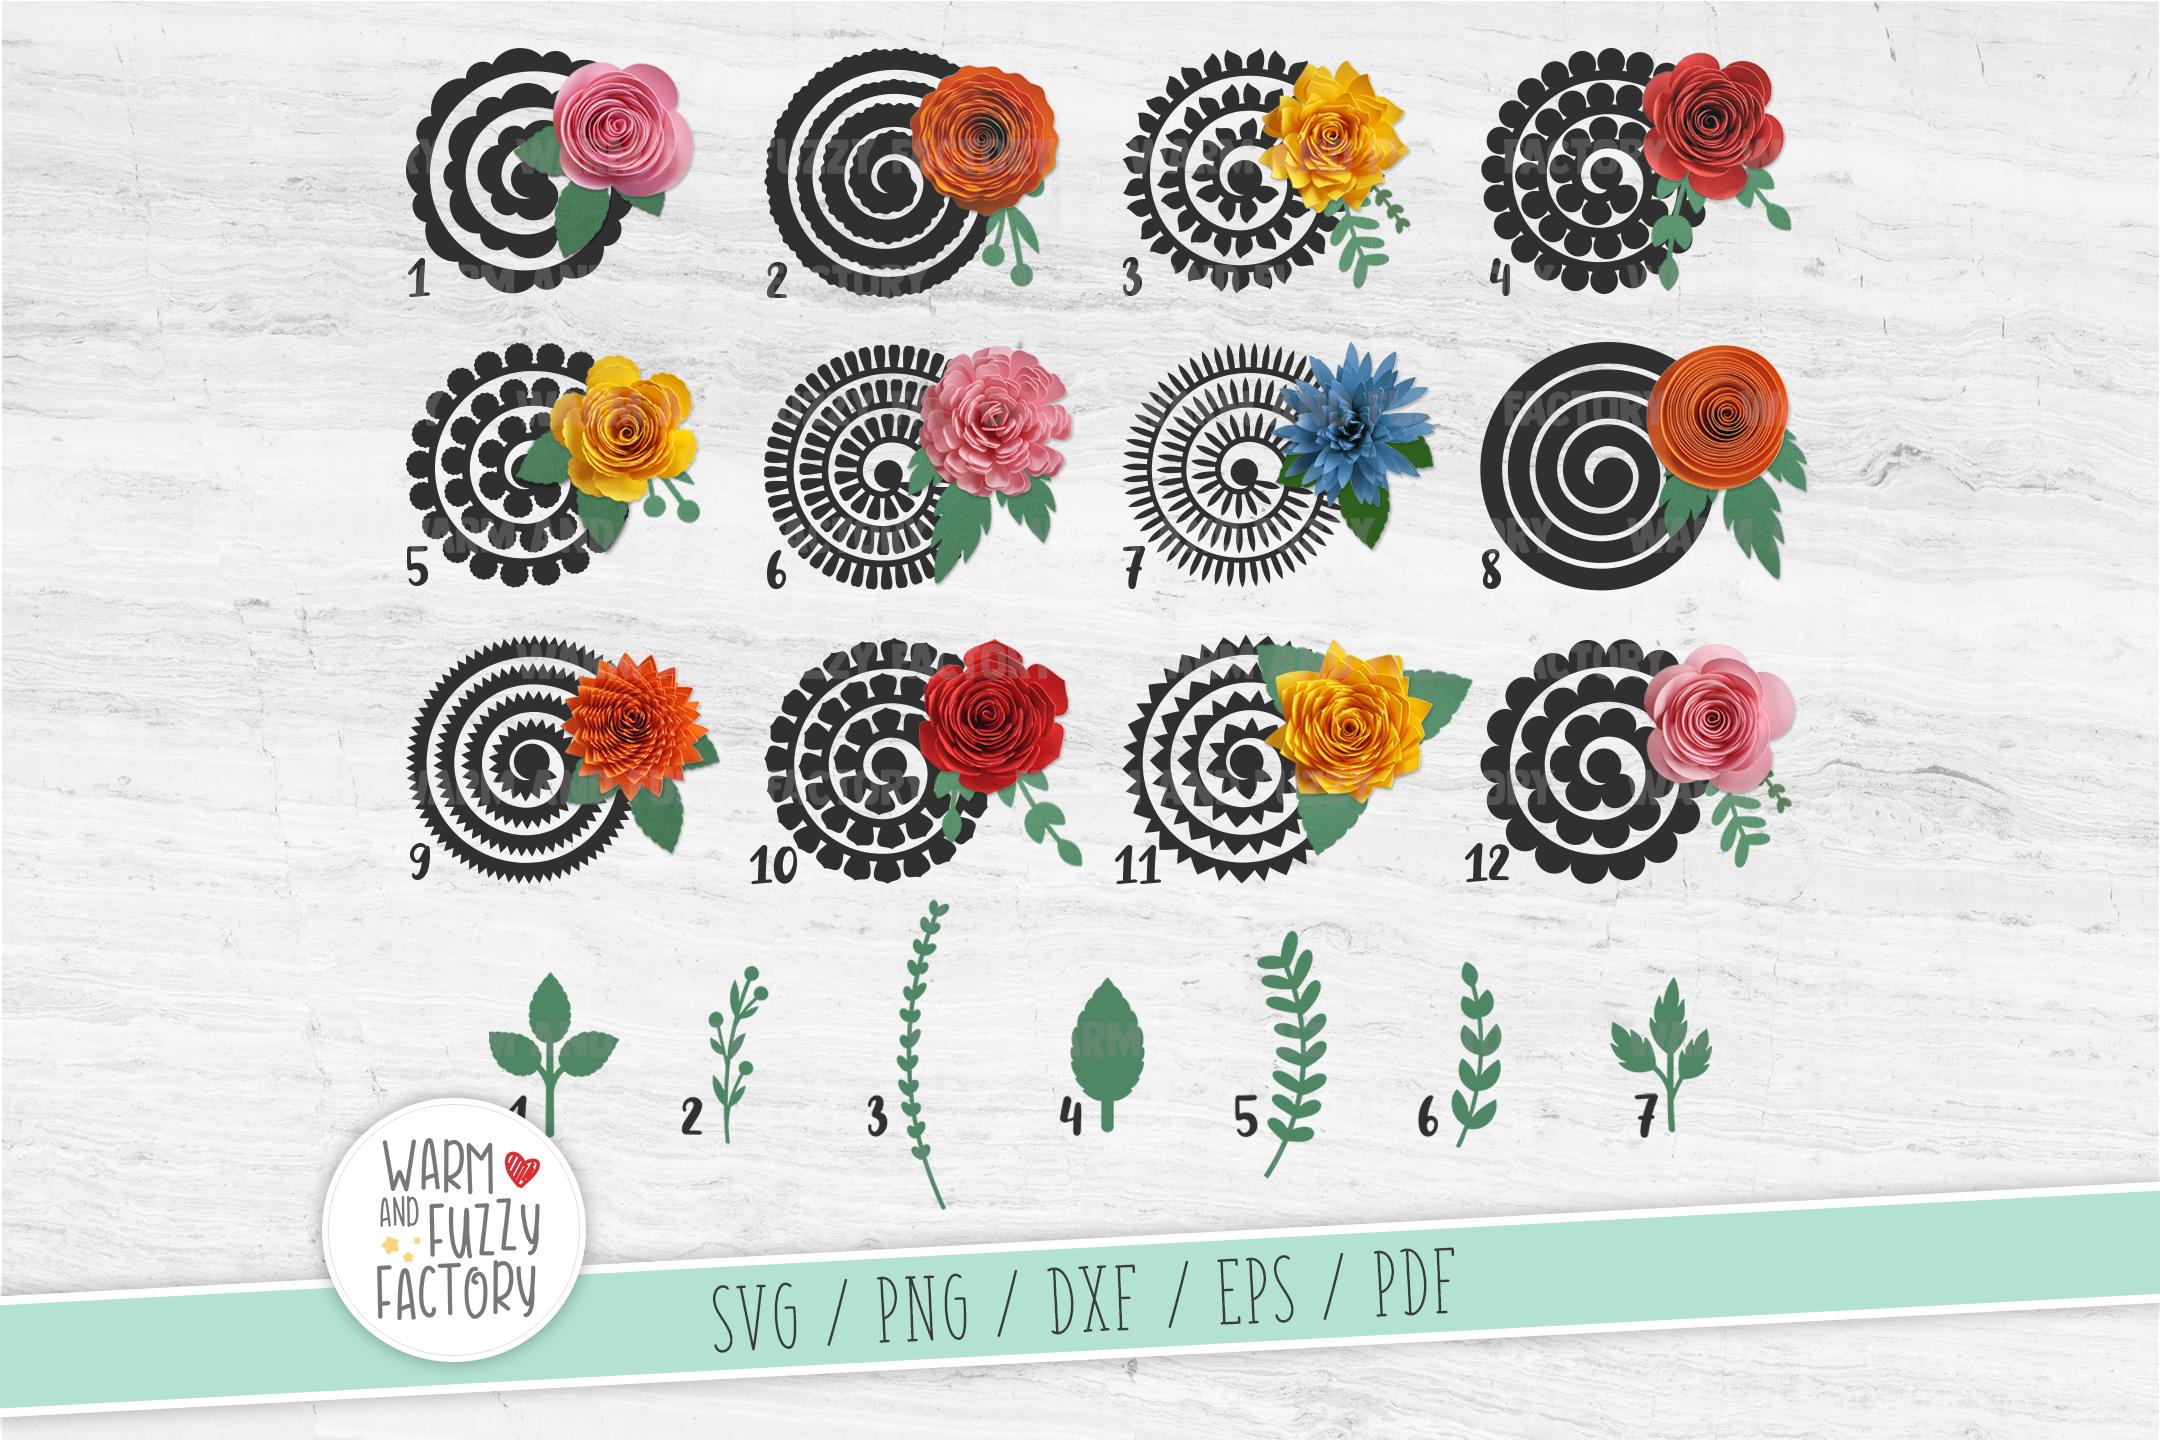 Paper flower template, Rolled flower svg, Paper flower svg example image 2